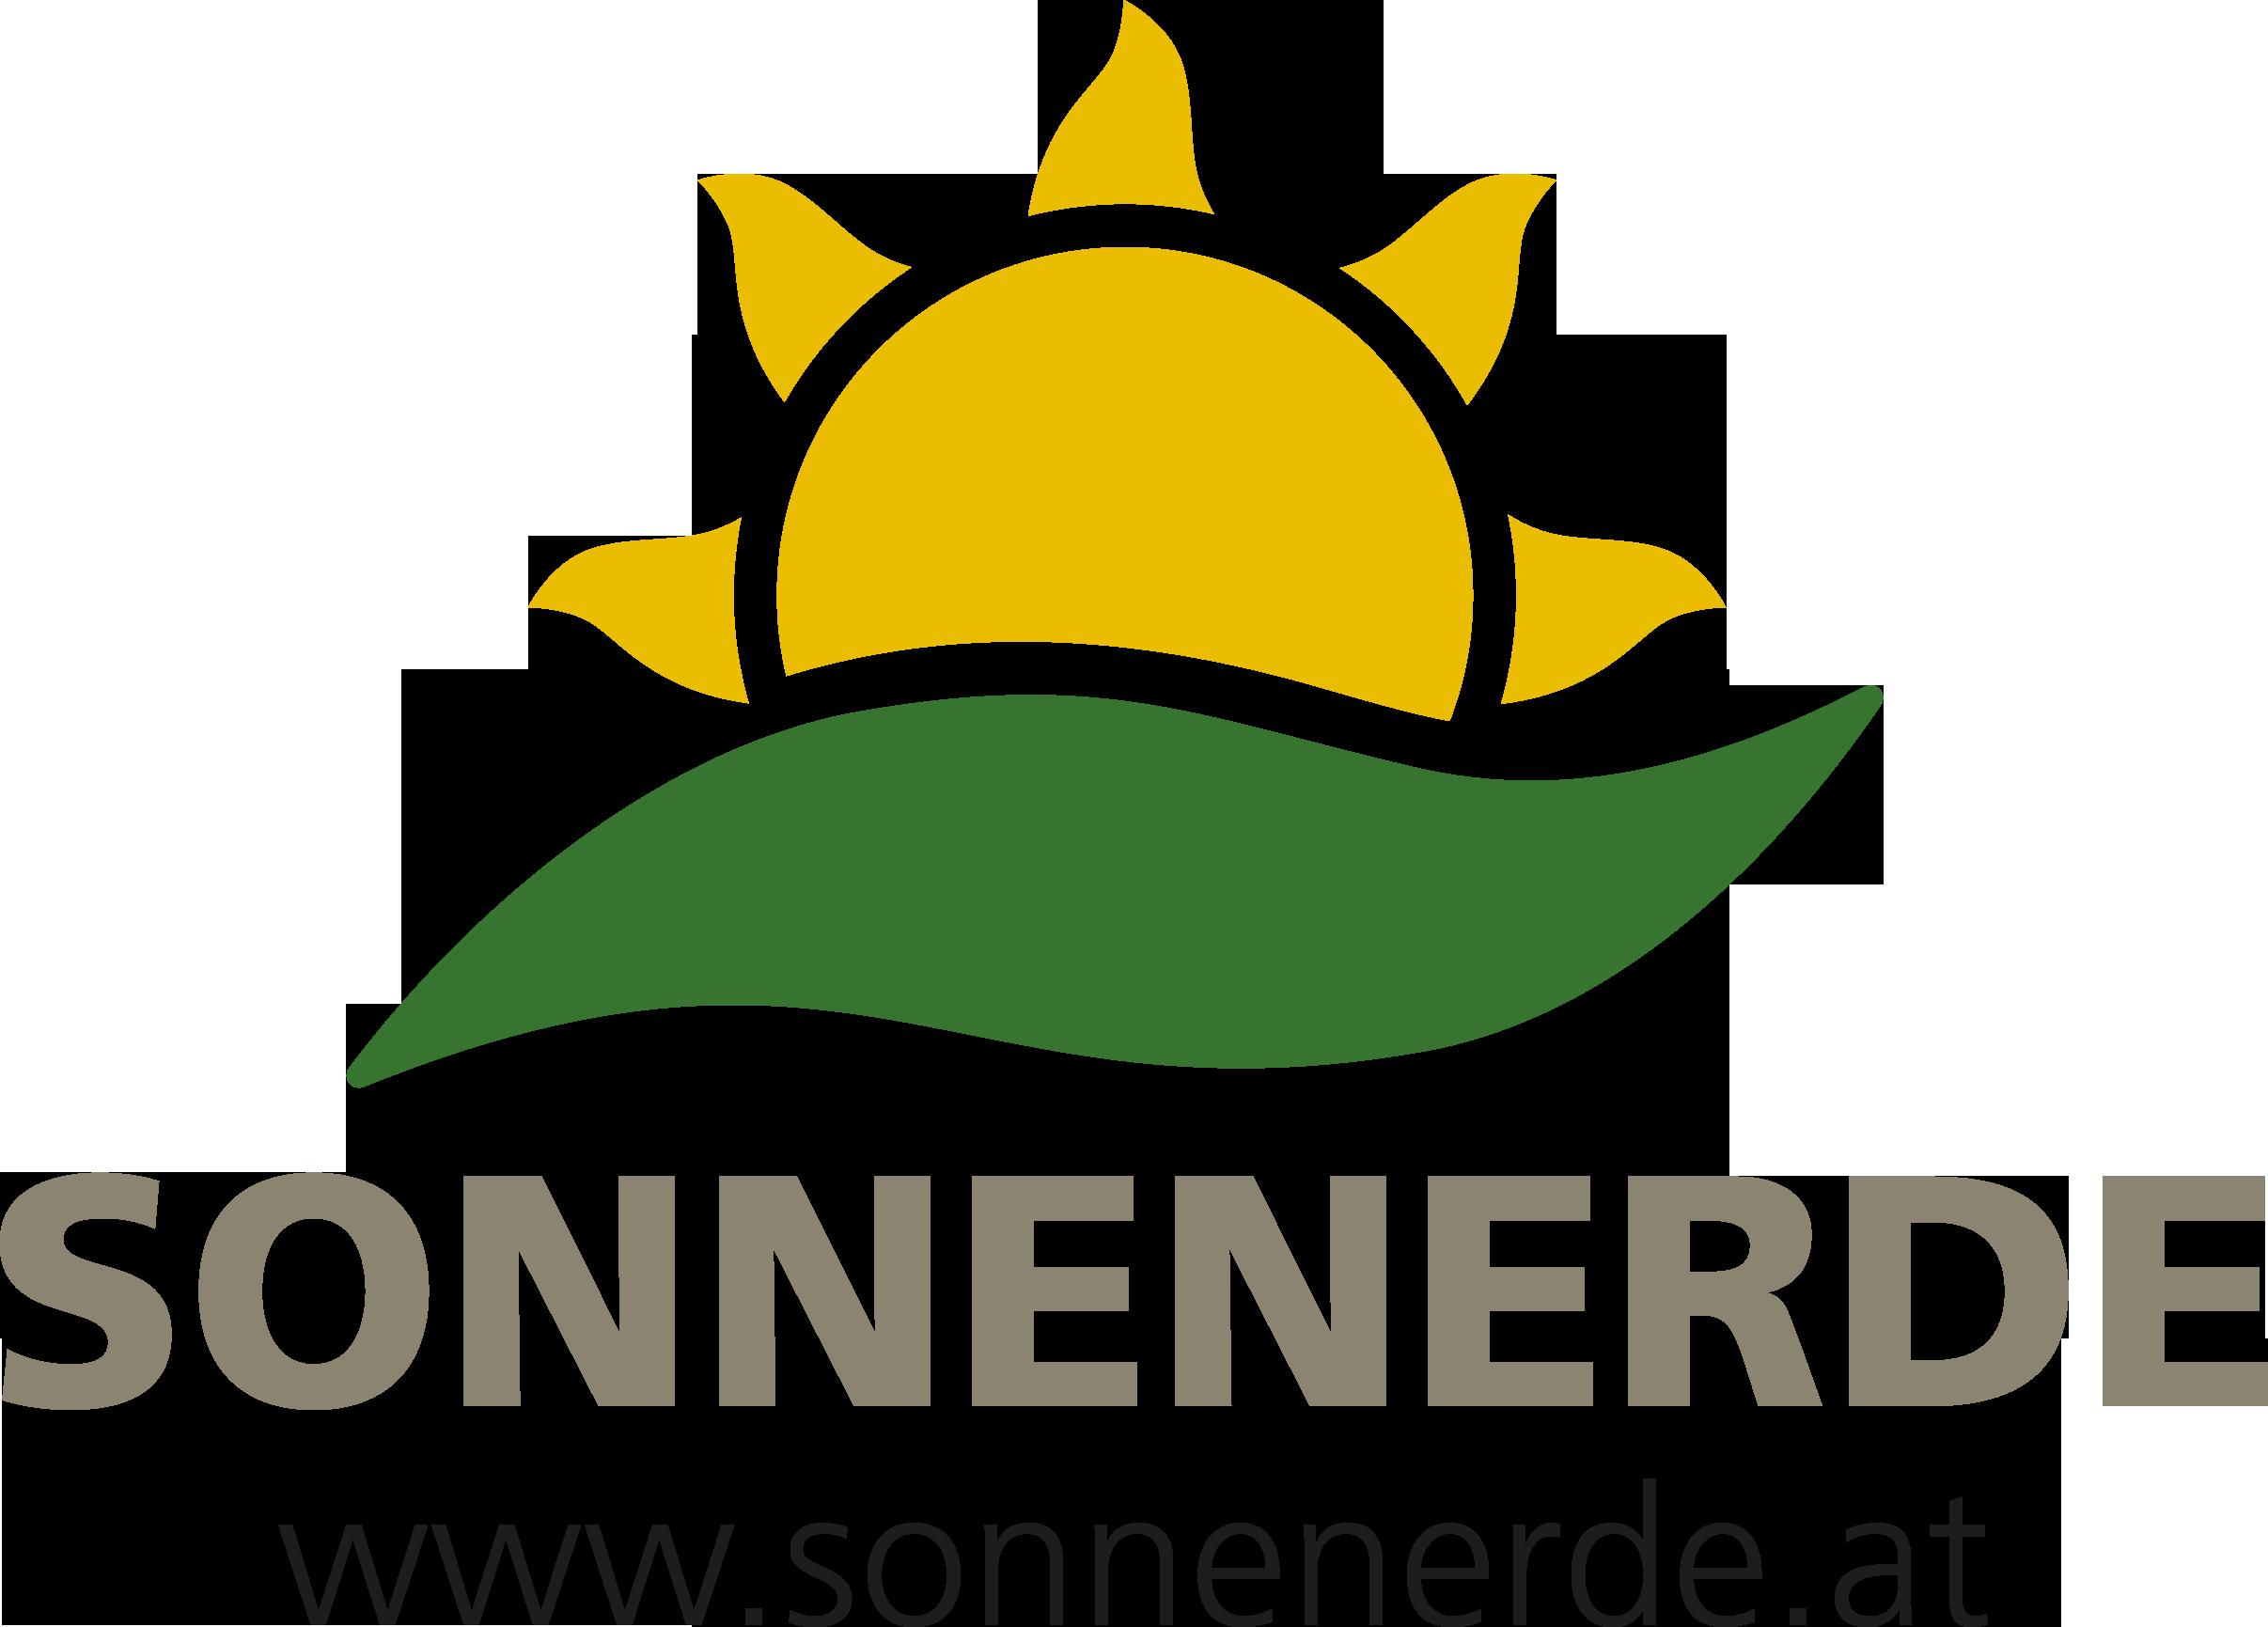 Sonnenerde GmbH Logo | CharLine GmbH